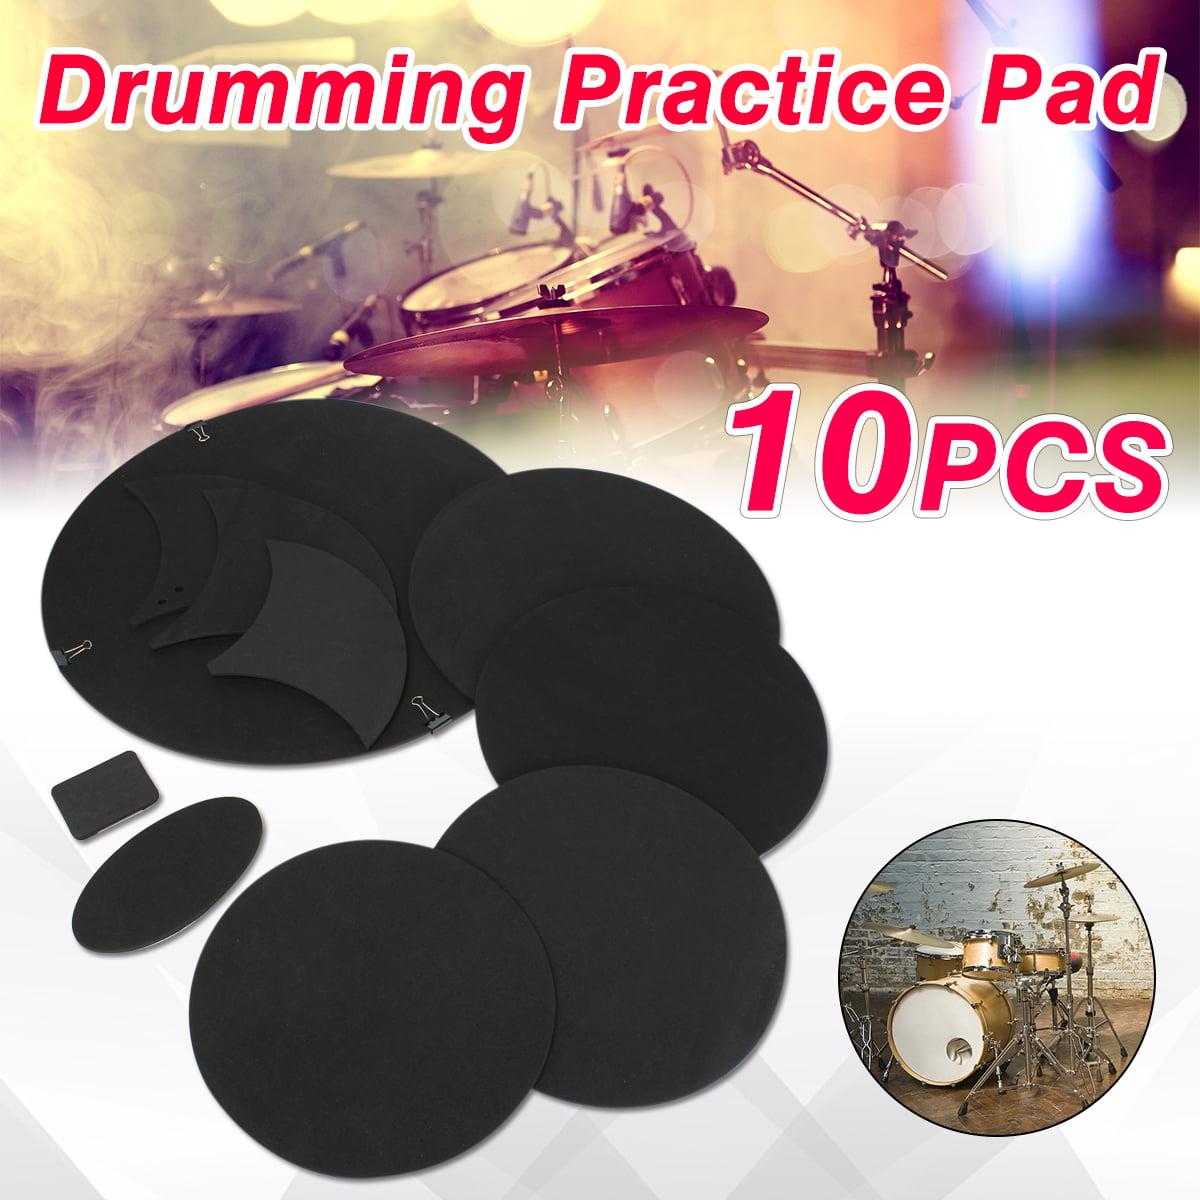 10Pcs/set Rubber Foam Flexibility Elasticity Bass Snare Quiet Drum Mute Silencers Dampeners Pads Drumming Practice Pad Black